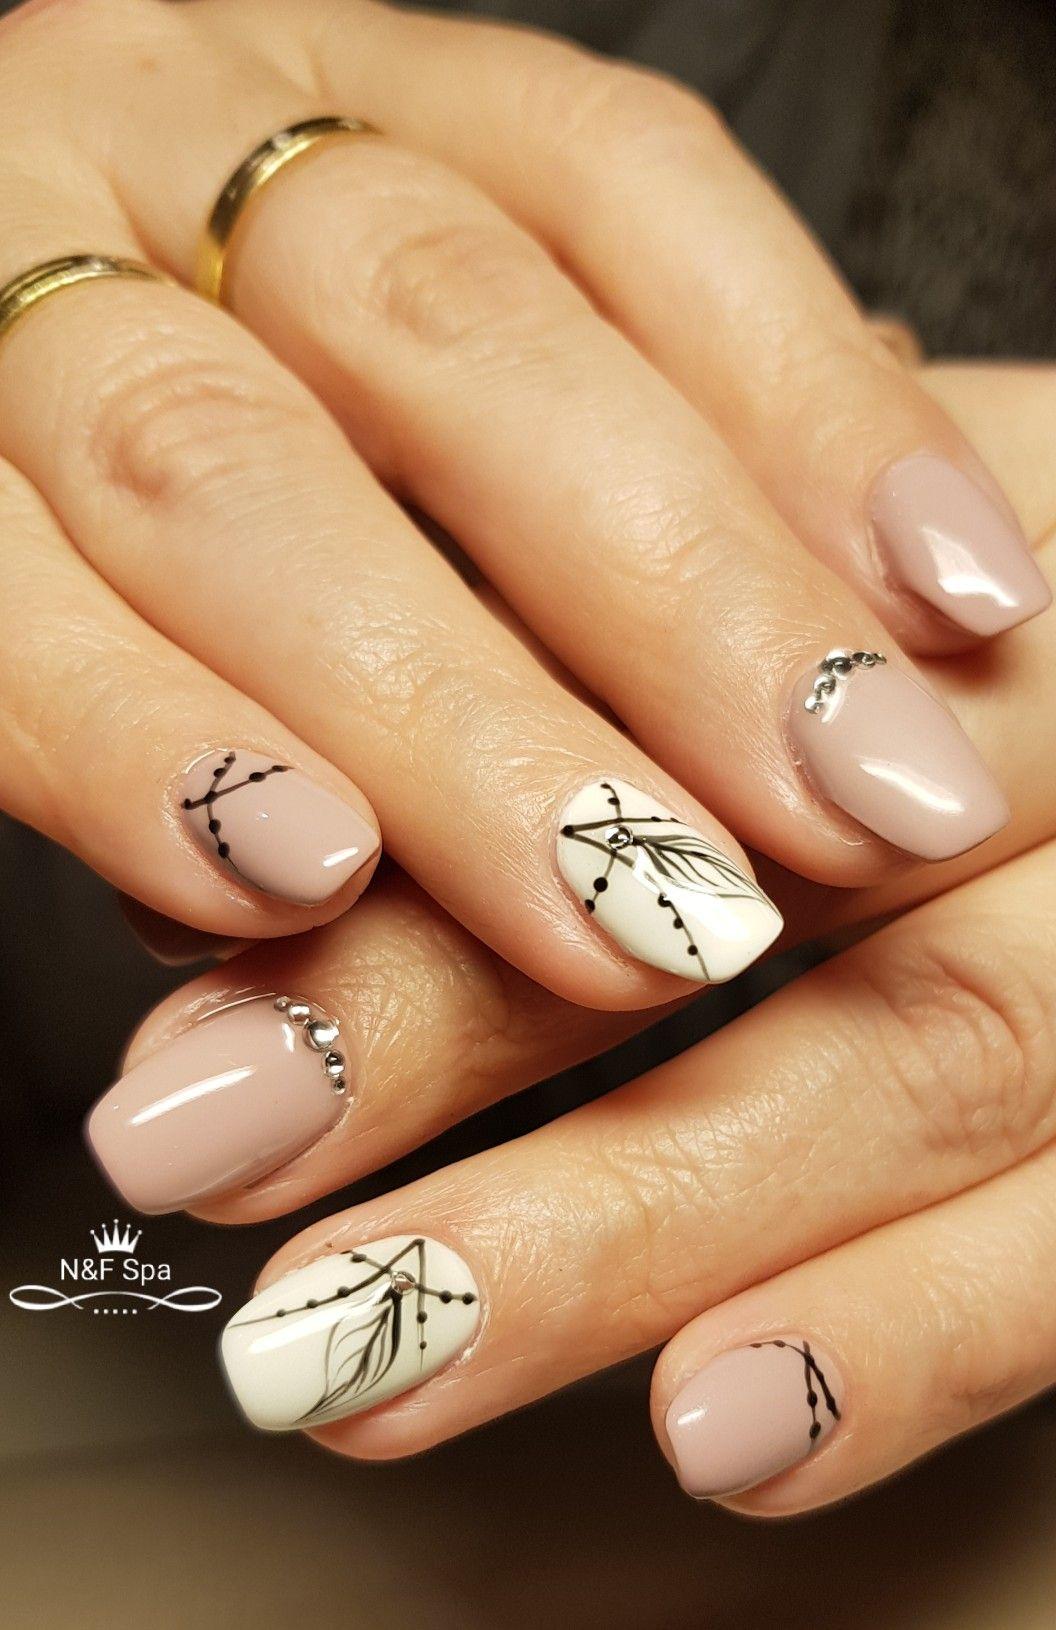 Pin by Olga Tukora on köröm   Pinterest   Instagram nails, Nail nail ...